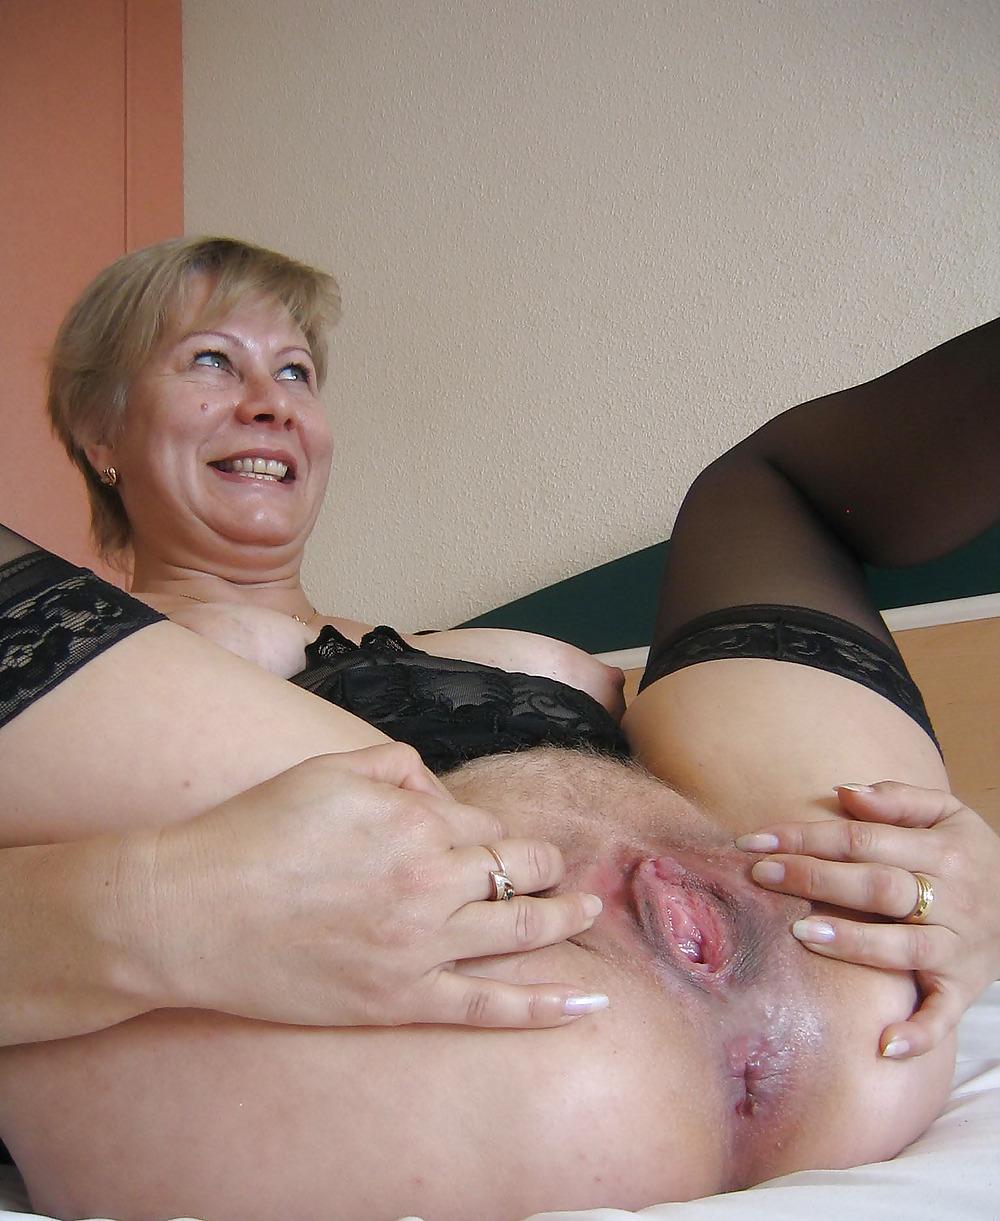 More Older Vaginas - 33 Pics  Xhamster-8636